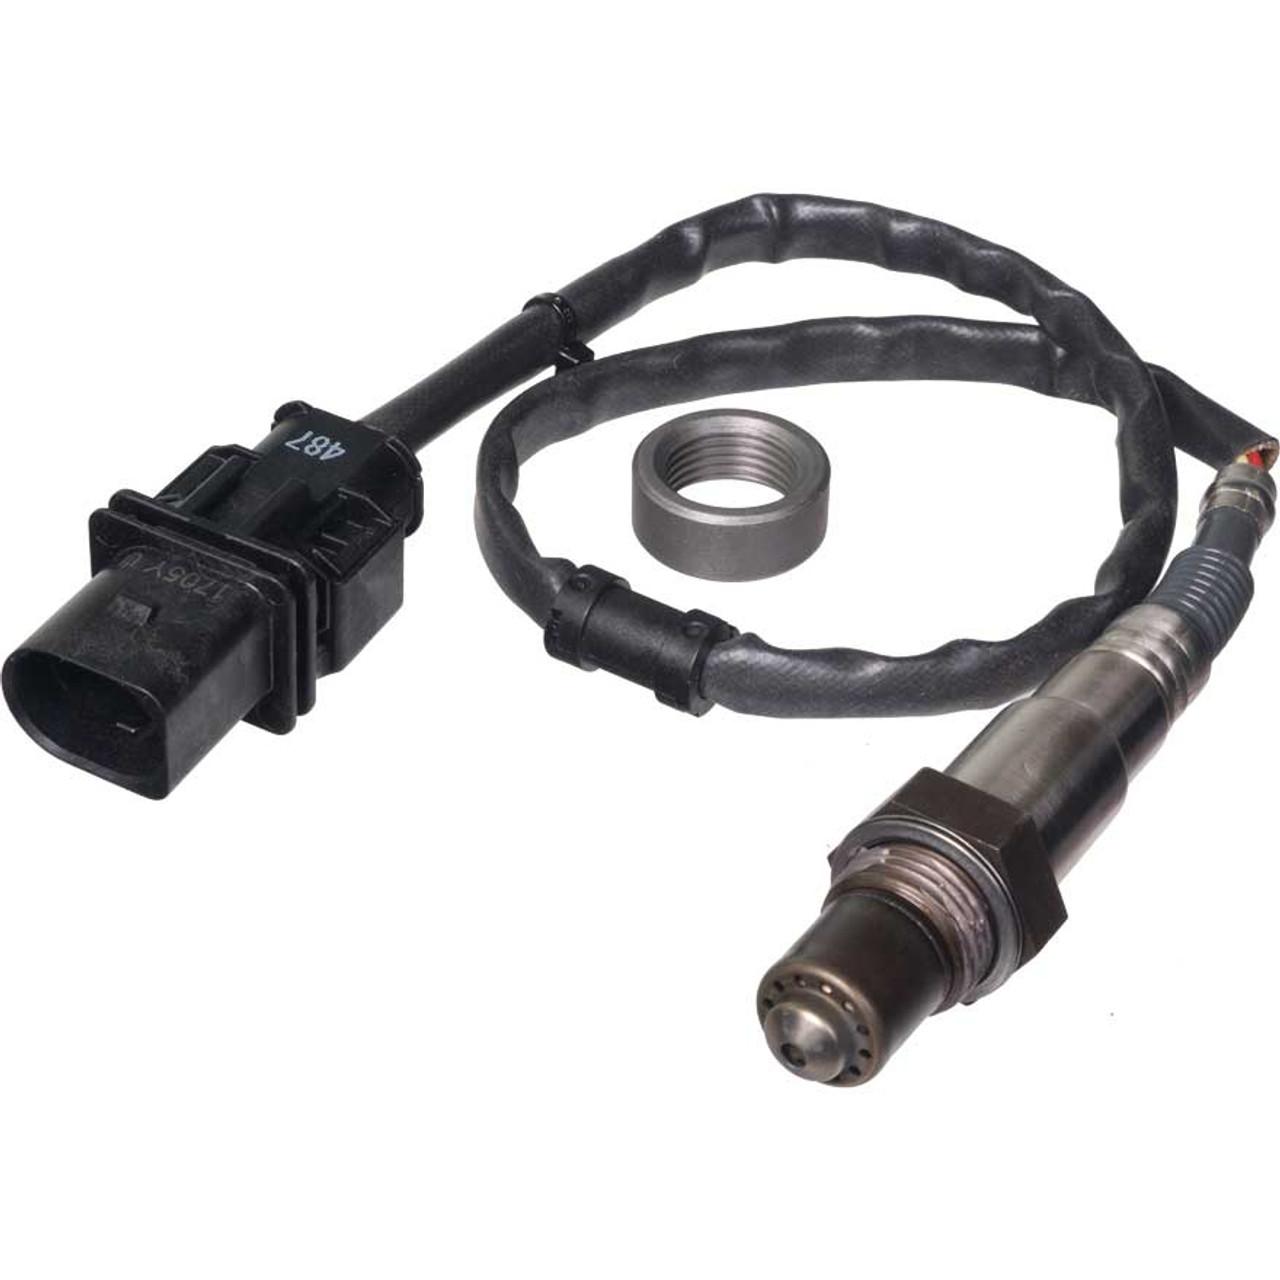 LSU 4.9 Wideband O2 Sensor (for the standalone AFWB gauge only)